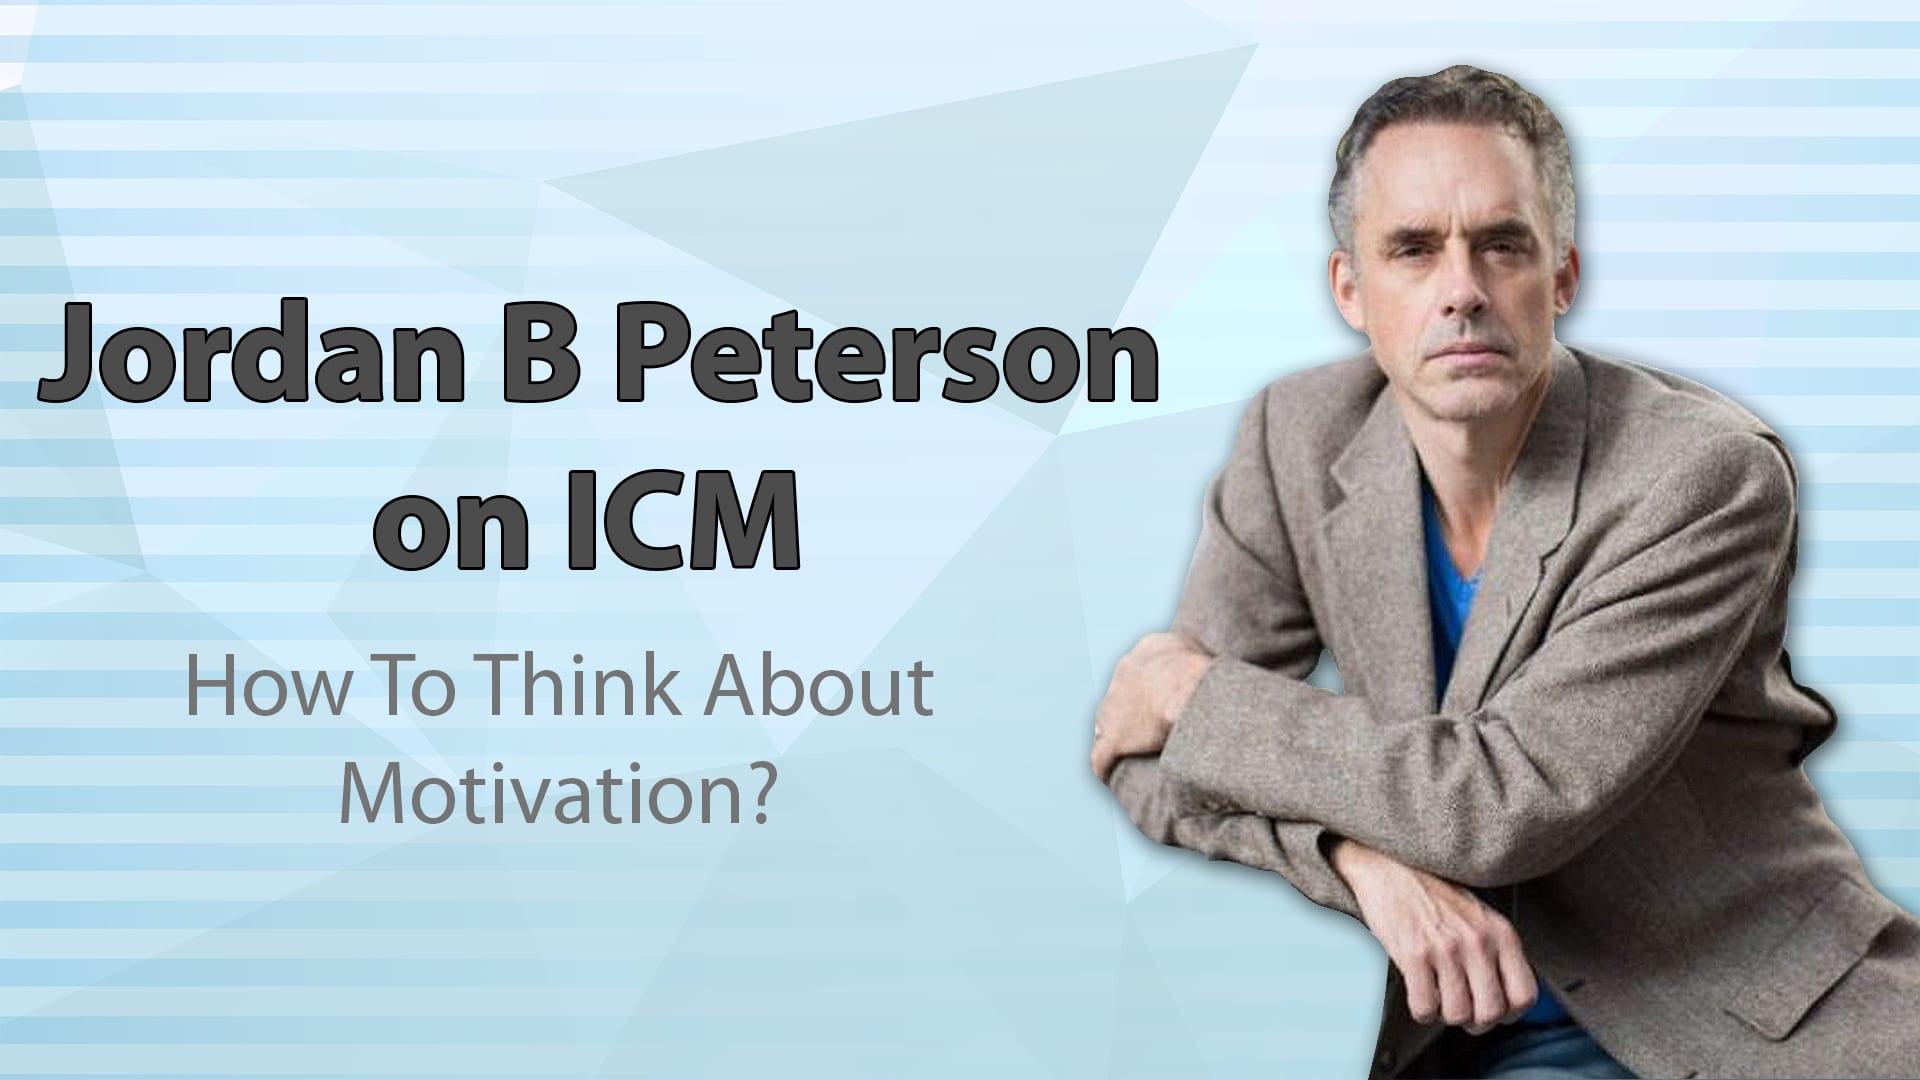 Jordan-B-Peterson-on-Solving-Problems03